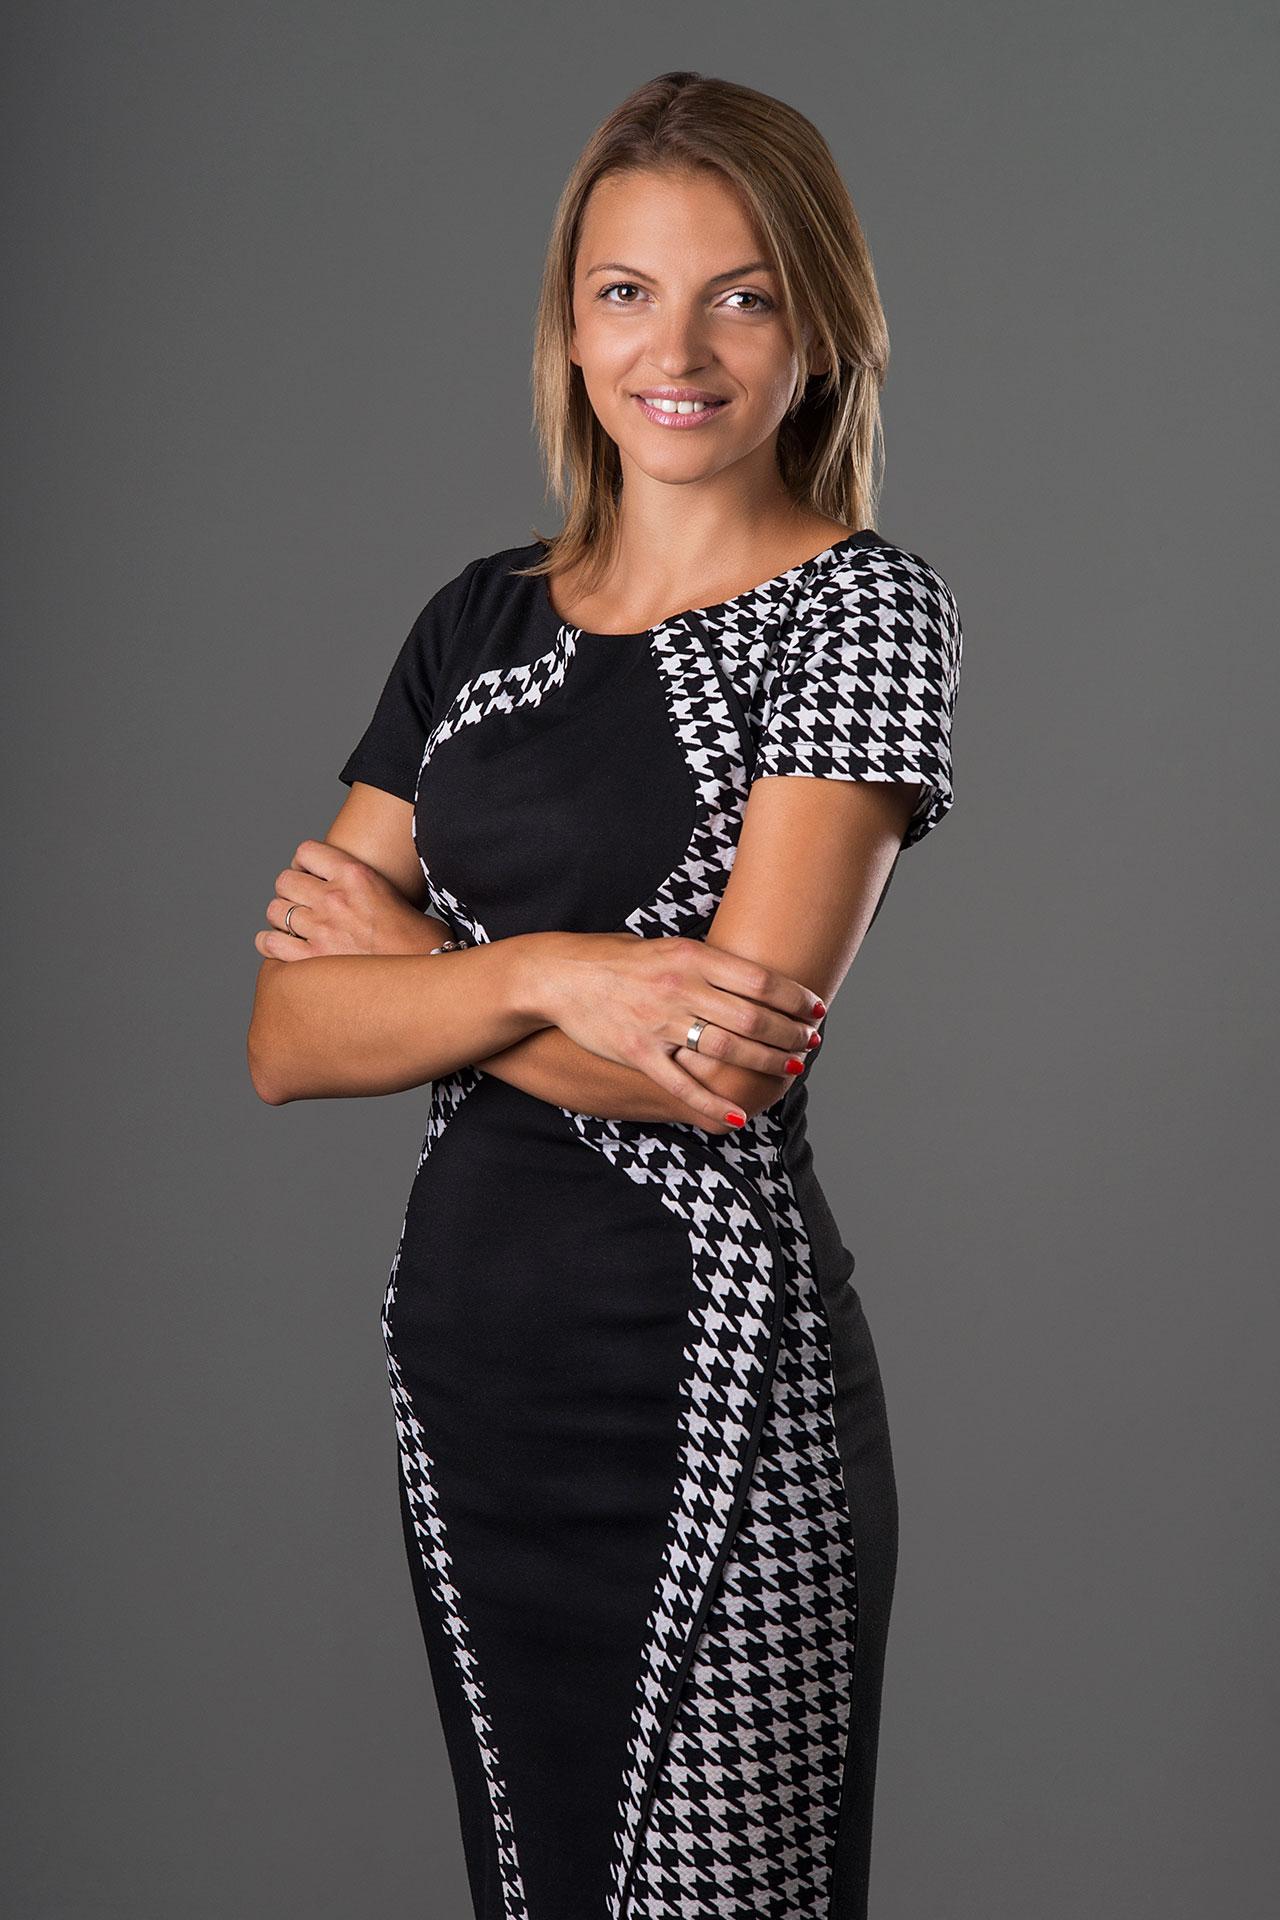 Radmila Krstić advokat u kancelariji Guberina-Marinkov iz Beograda